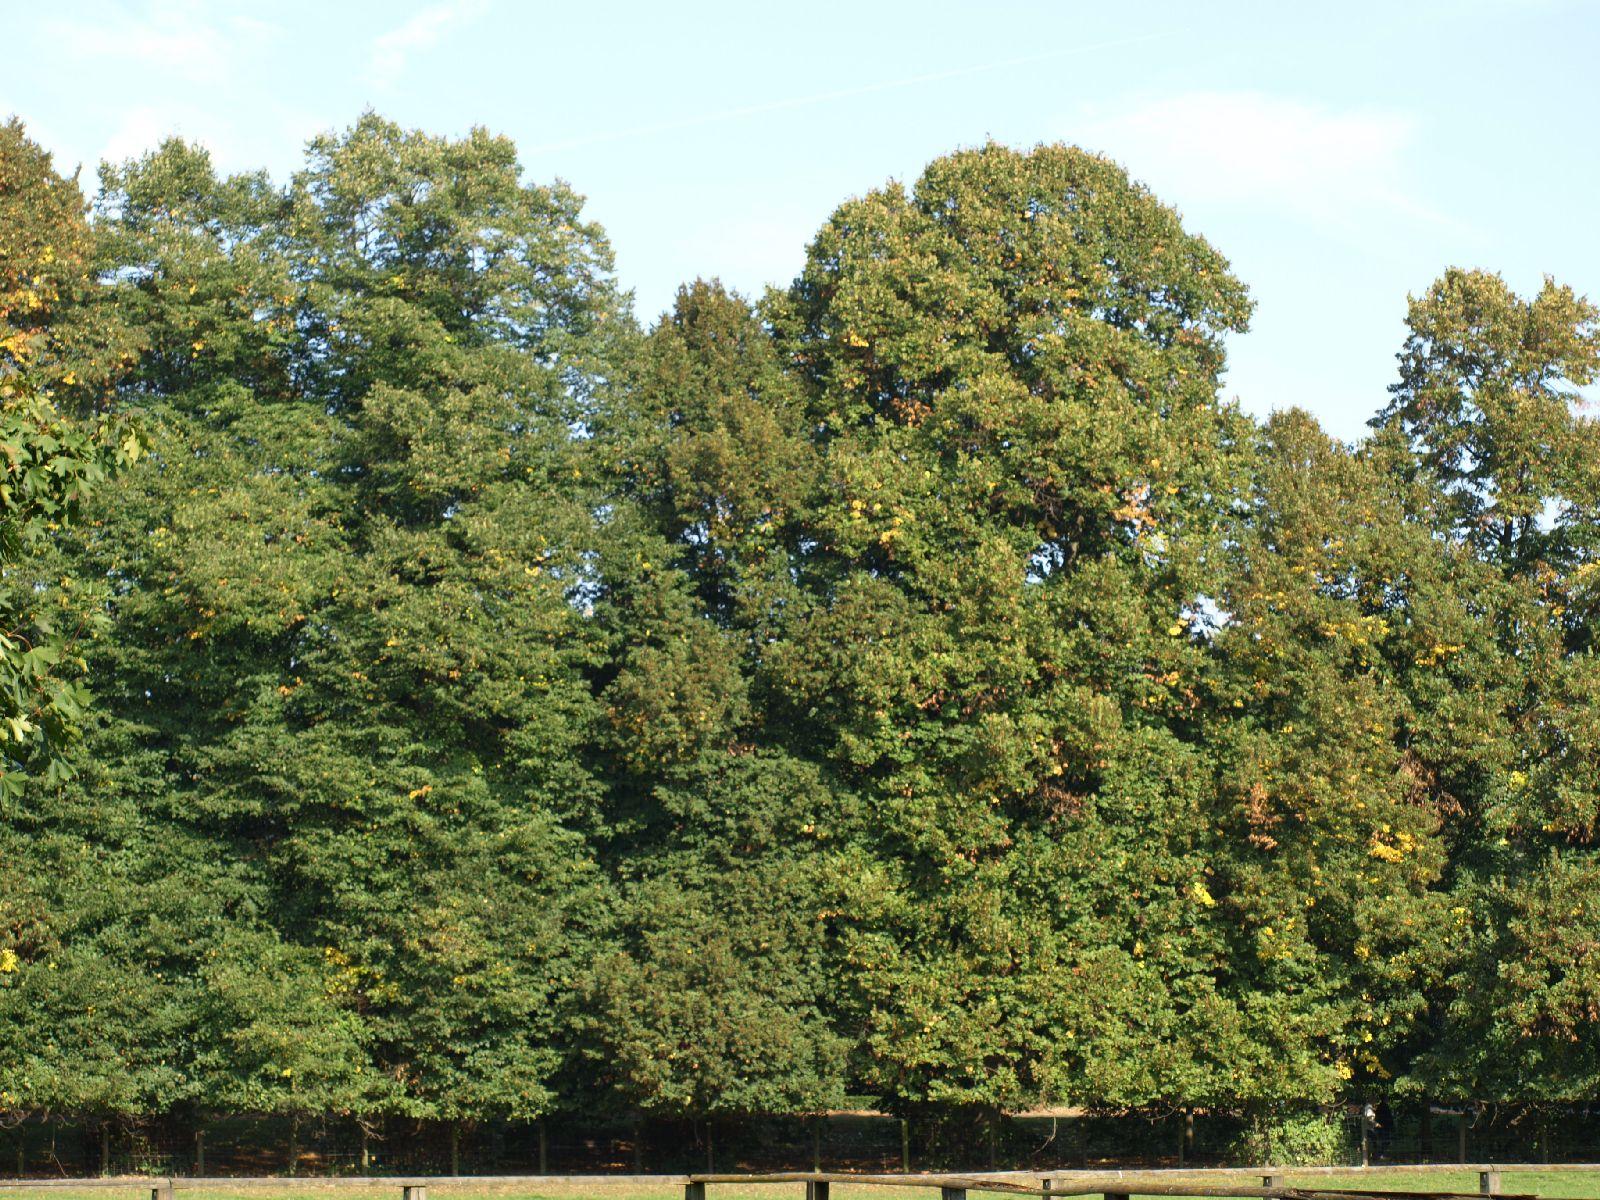 Pflanzen-Baum-Foto_Textur_B_P9279879